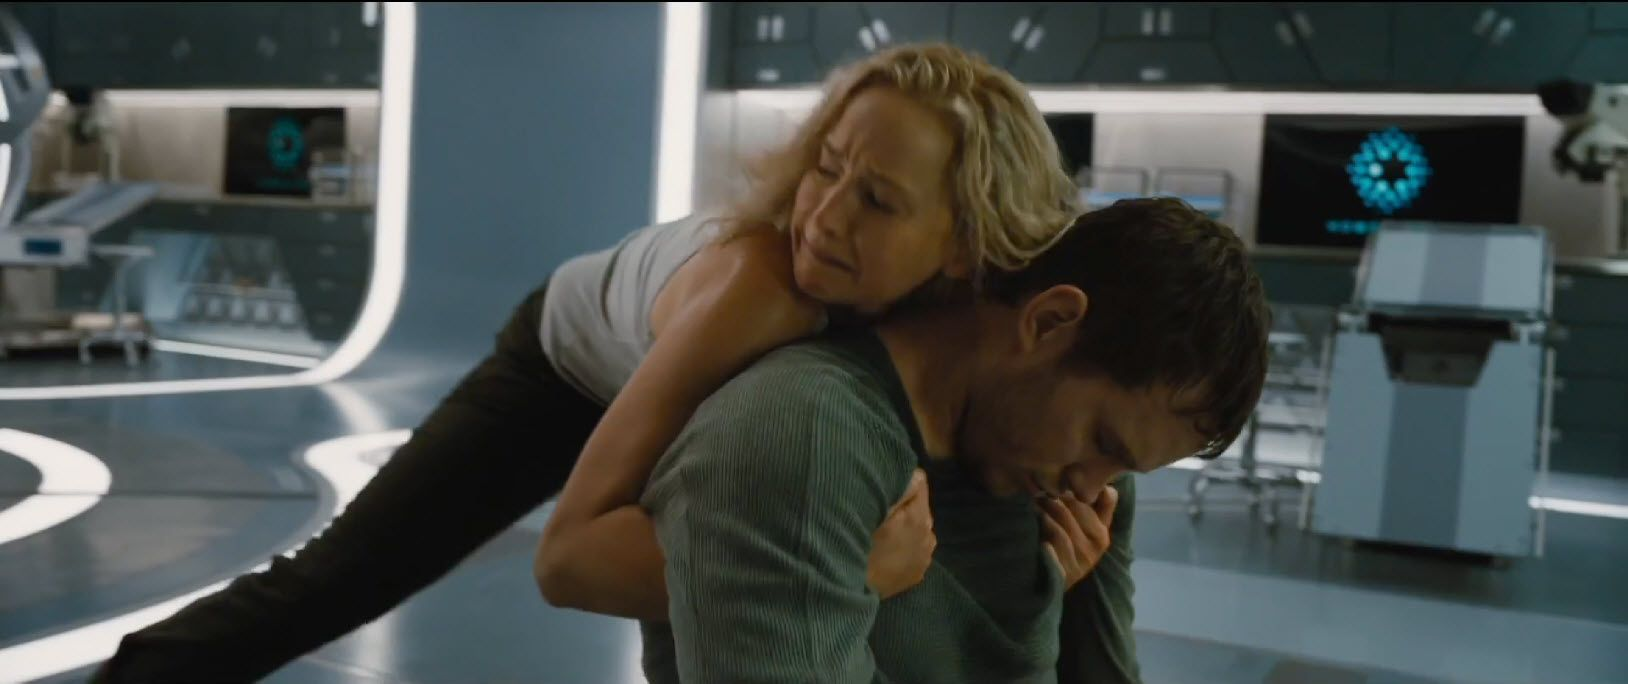 Passengers Trailer Lands Along With New Chris Pratt Jennifer Lawrence Images Jennifer Lawrence Images Passengers Movie Jennifer Lawrence